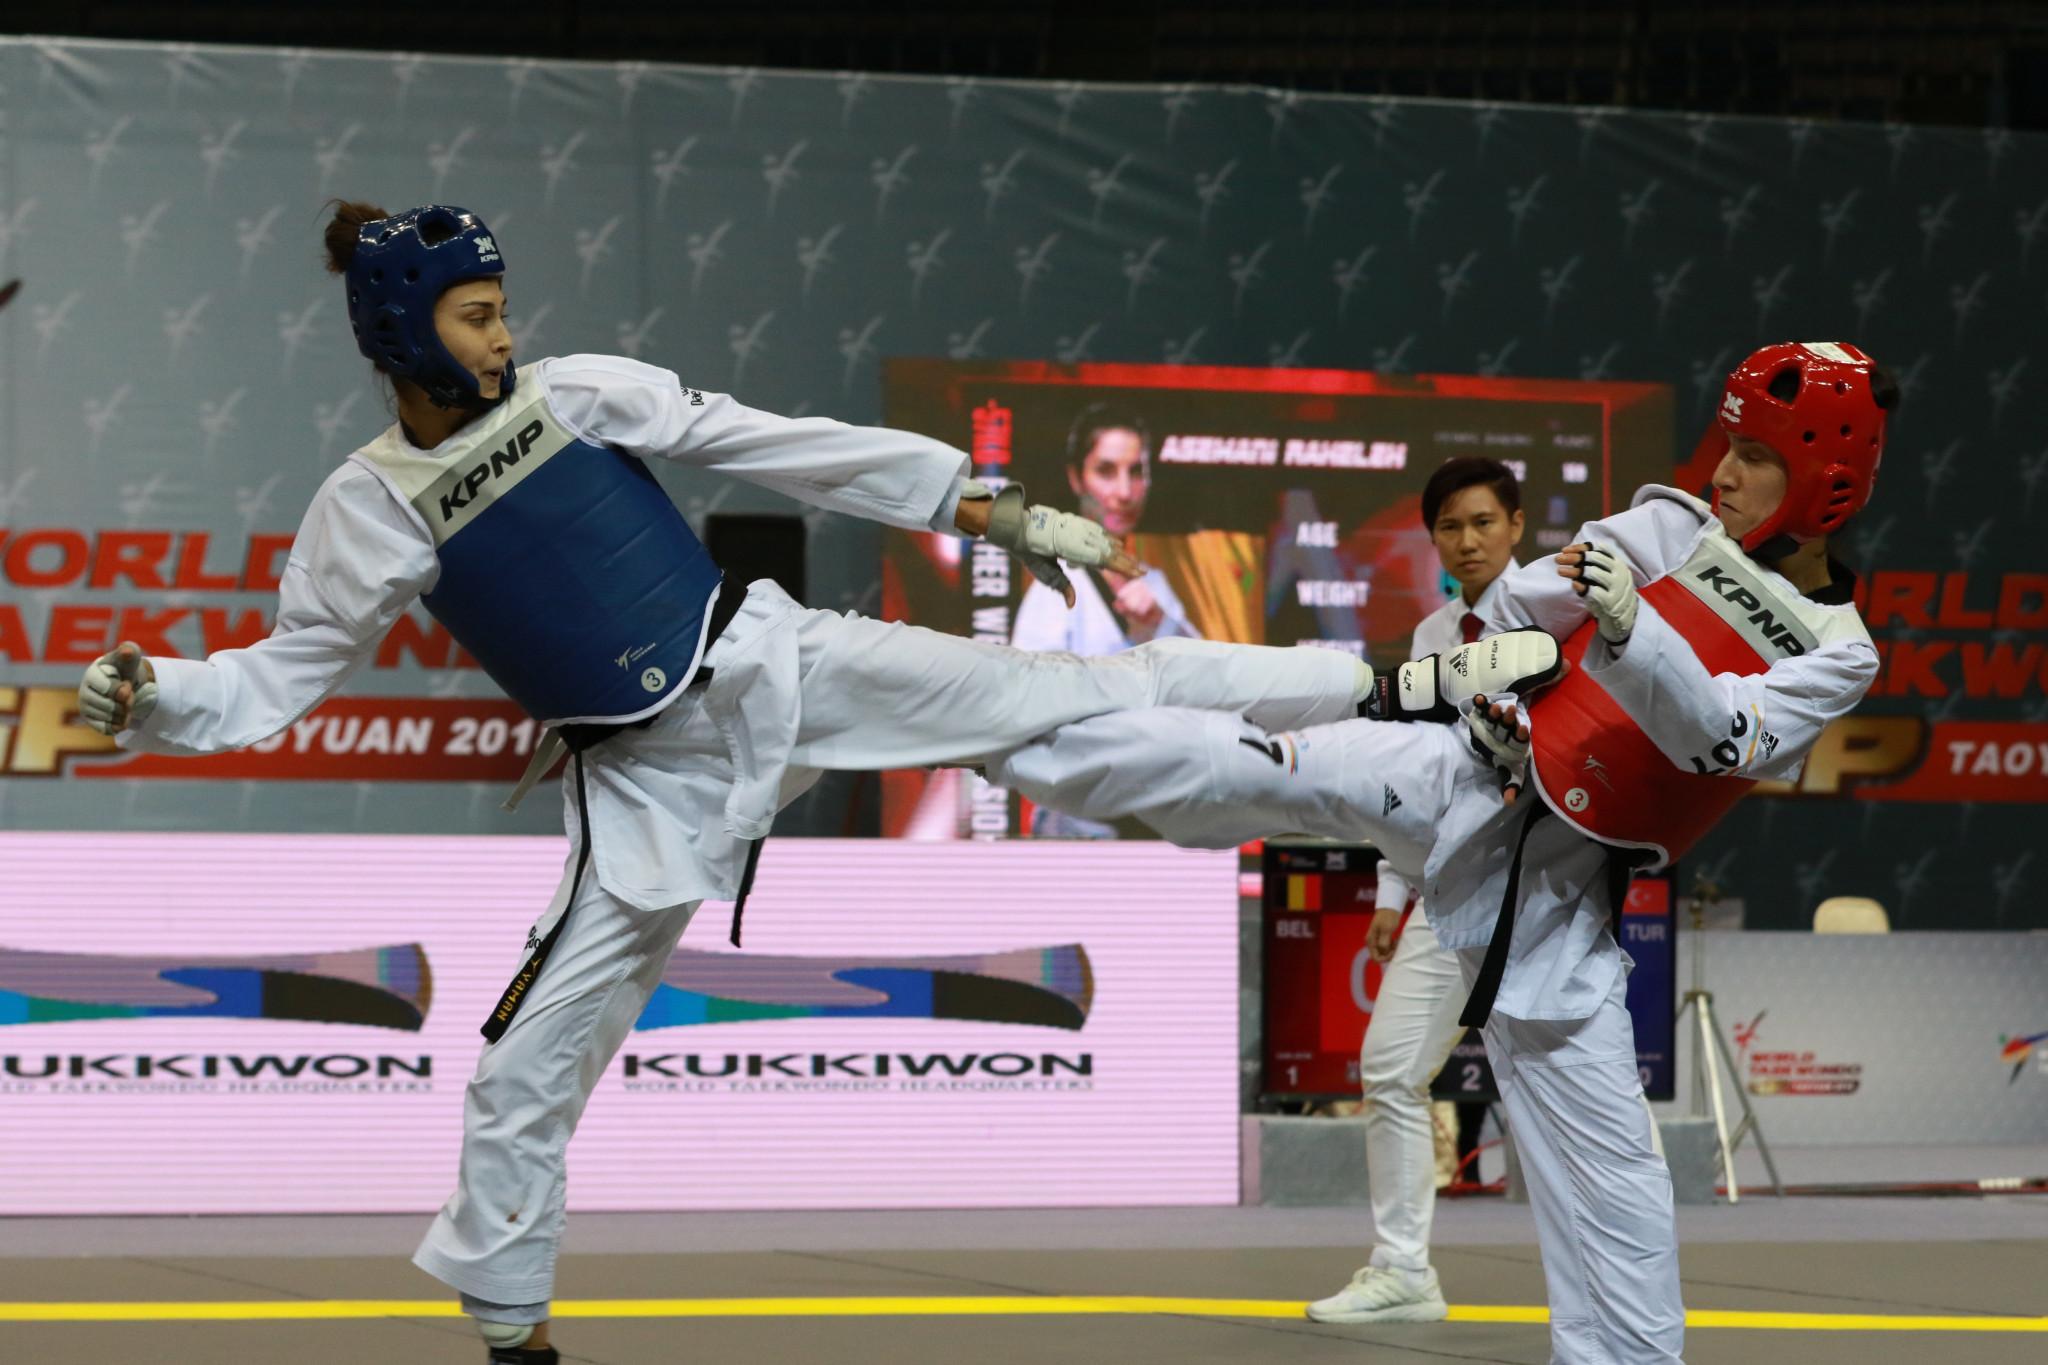 Turkey's Irem Yaman beat Belgium's Raheleh Asemani in the women's under-57 kilograms final at the World Taekwondo Grand Prix in Taoyuan ©World Taekwondo